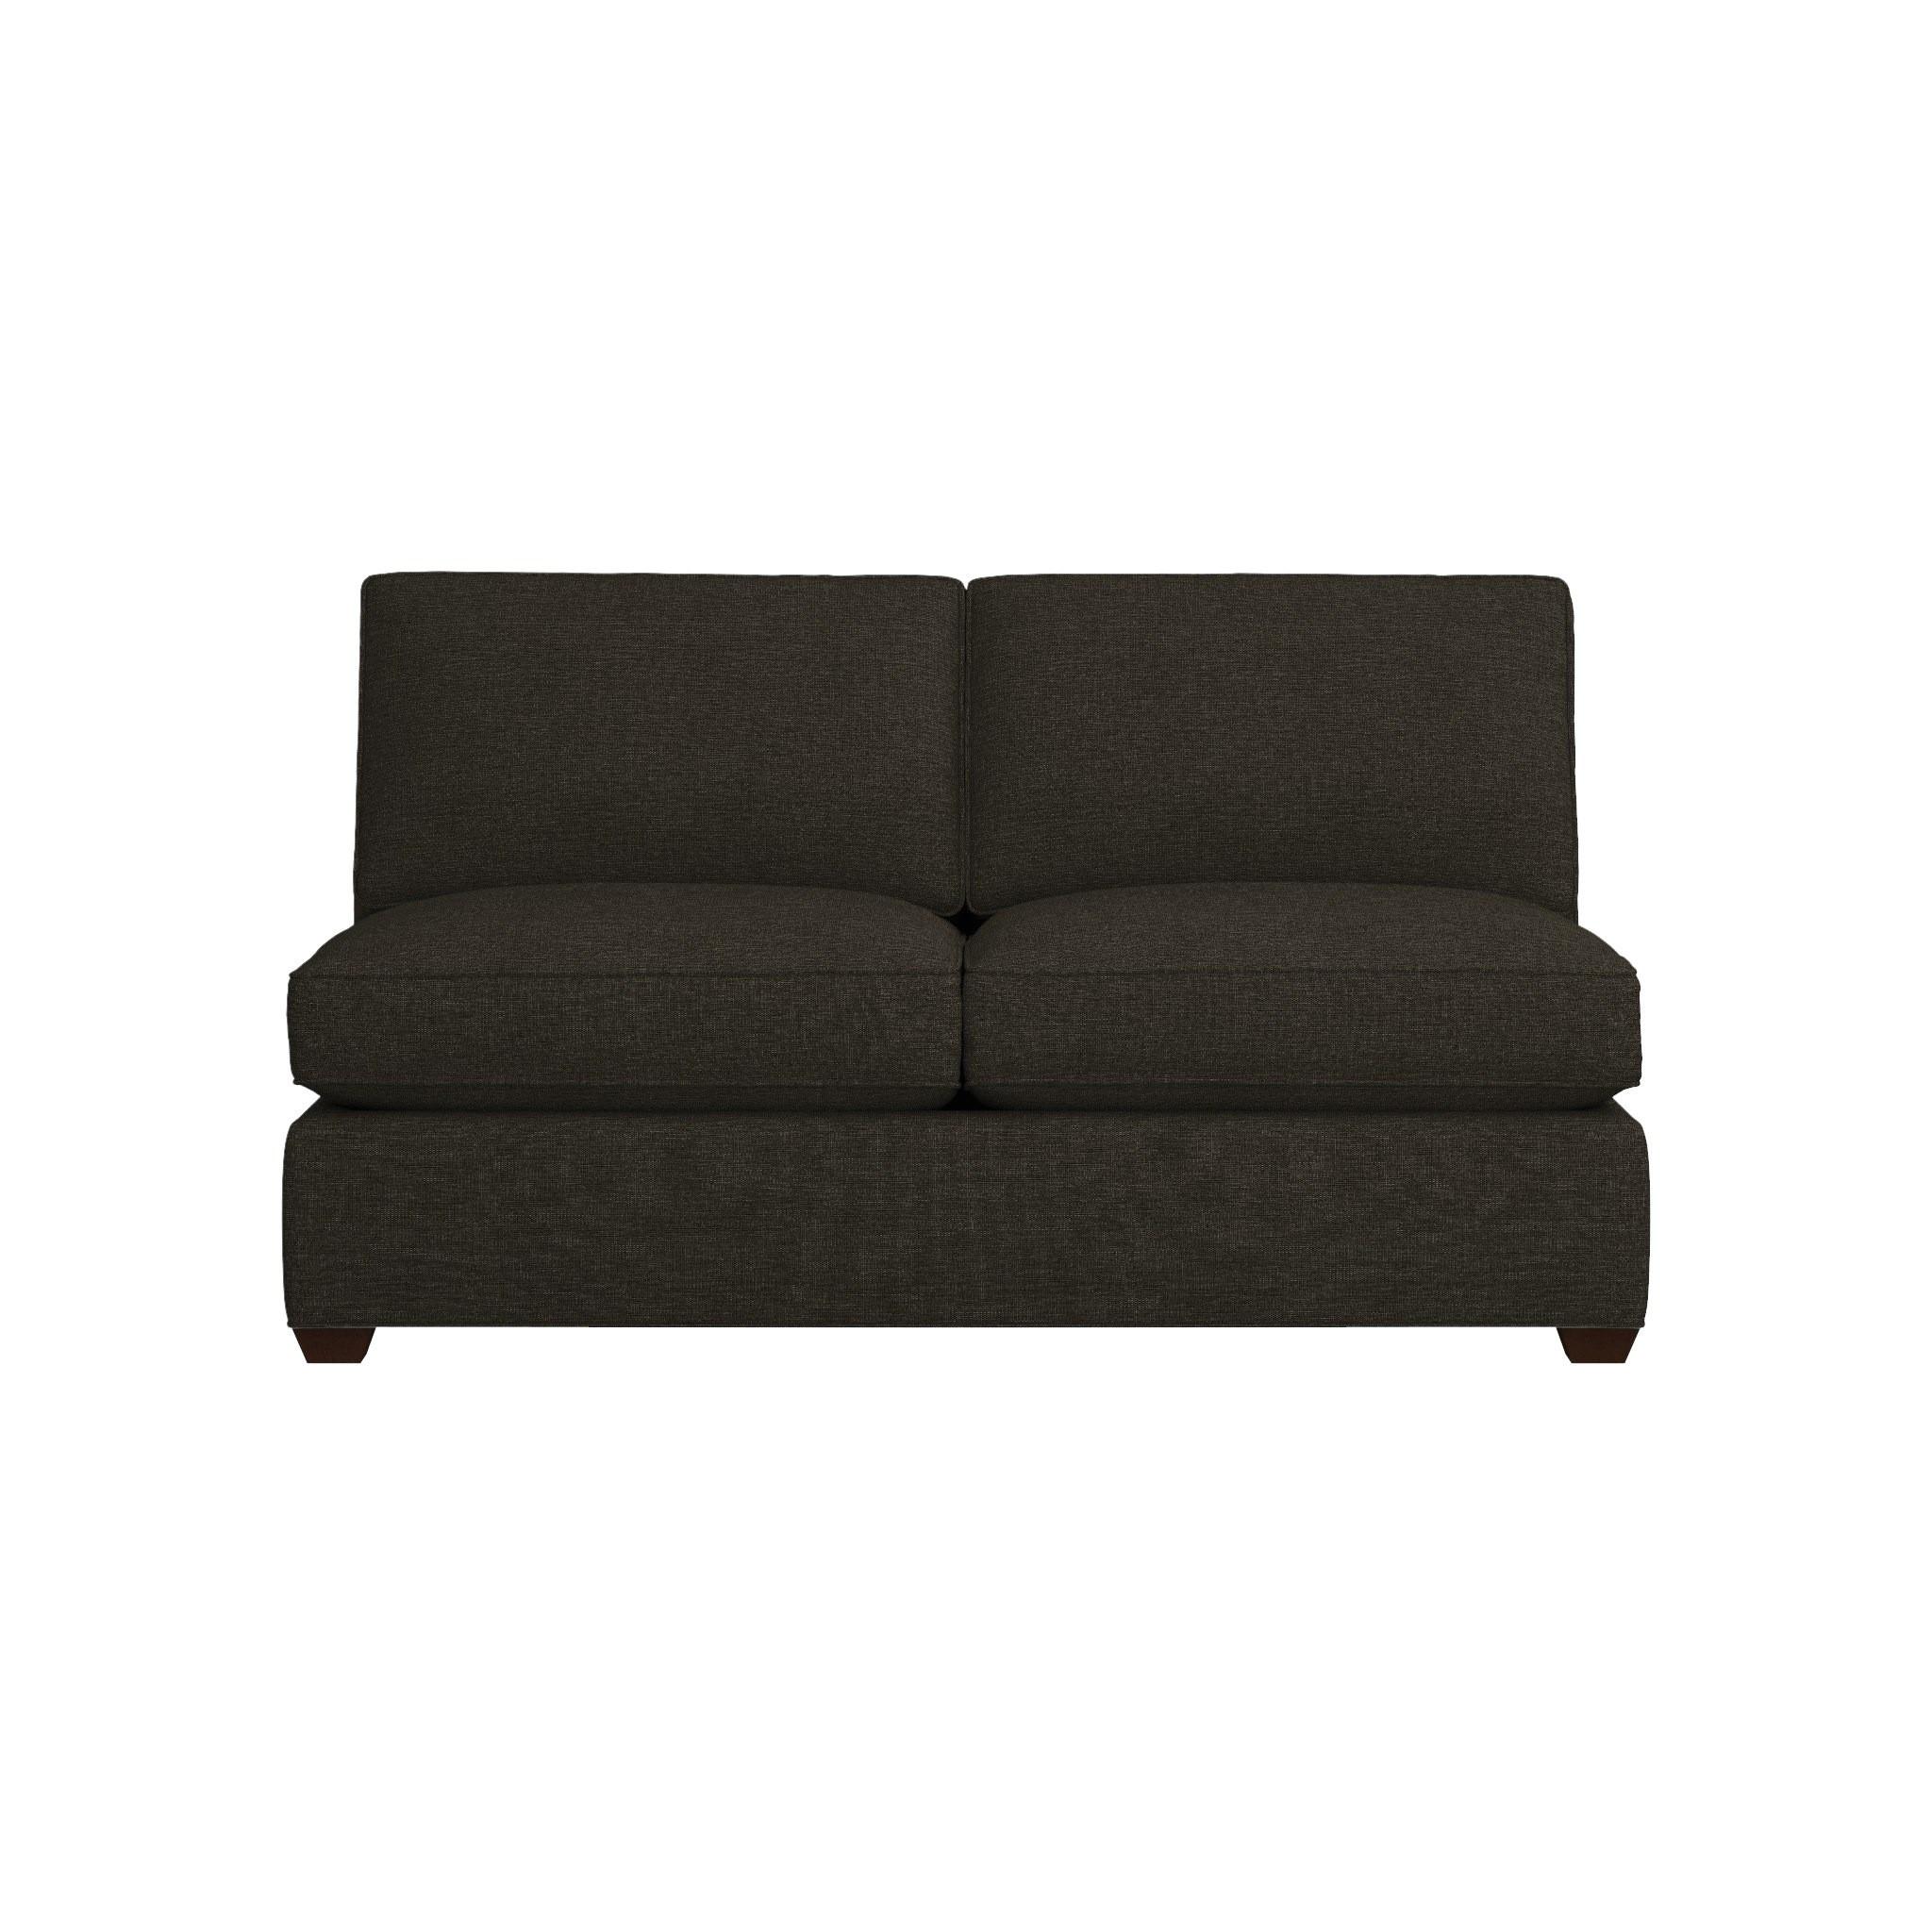 Replacement Cushions for This End Up sofa 27 Einzigartig Schlafsofa Rosa Galerie Schlafsofa Ideen Und Bilder